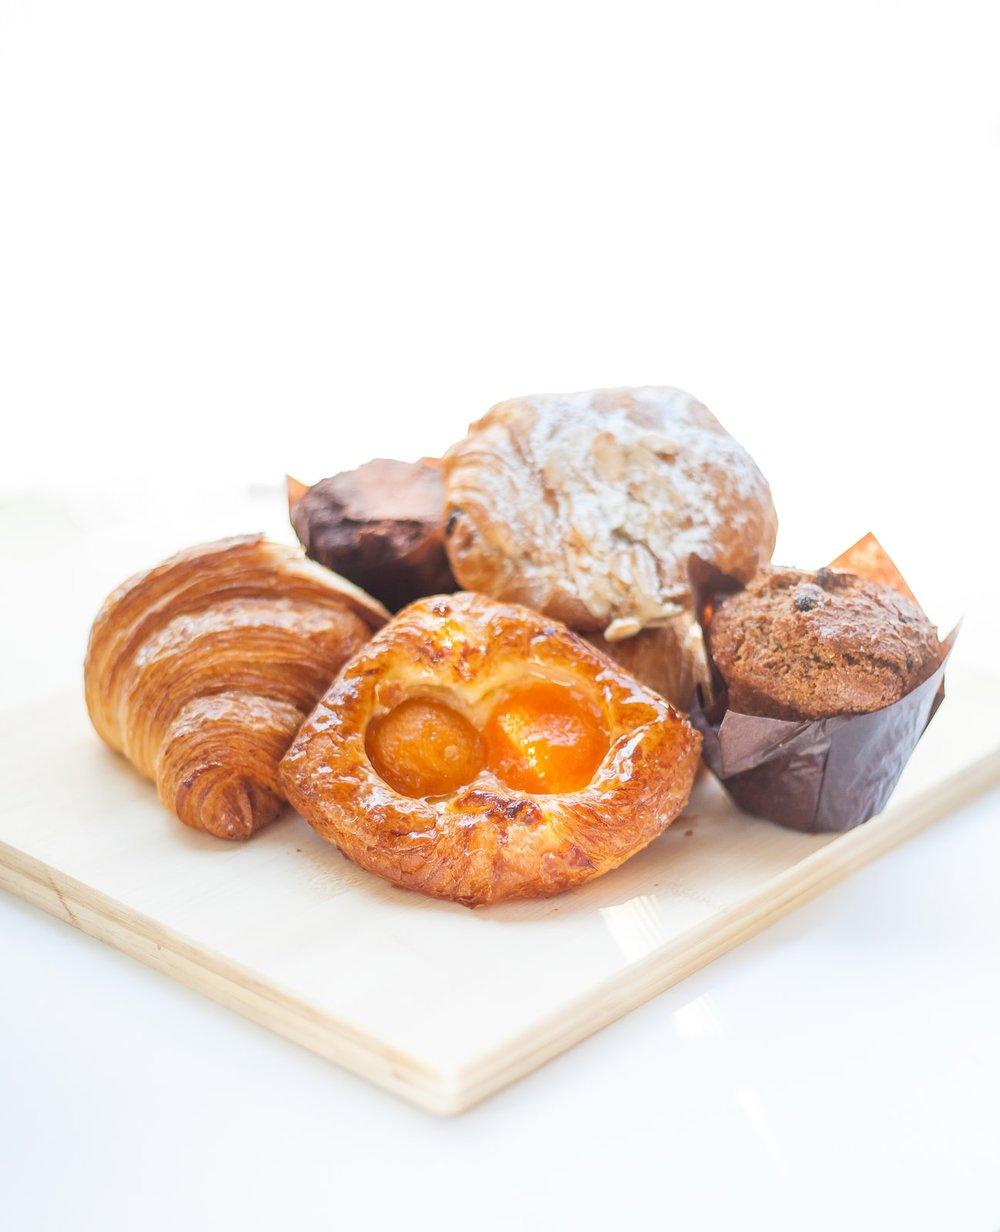 Our Parisian Artisan French pastries